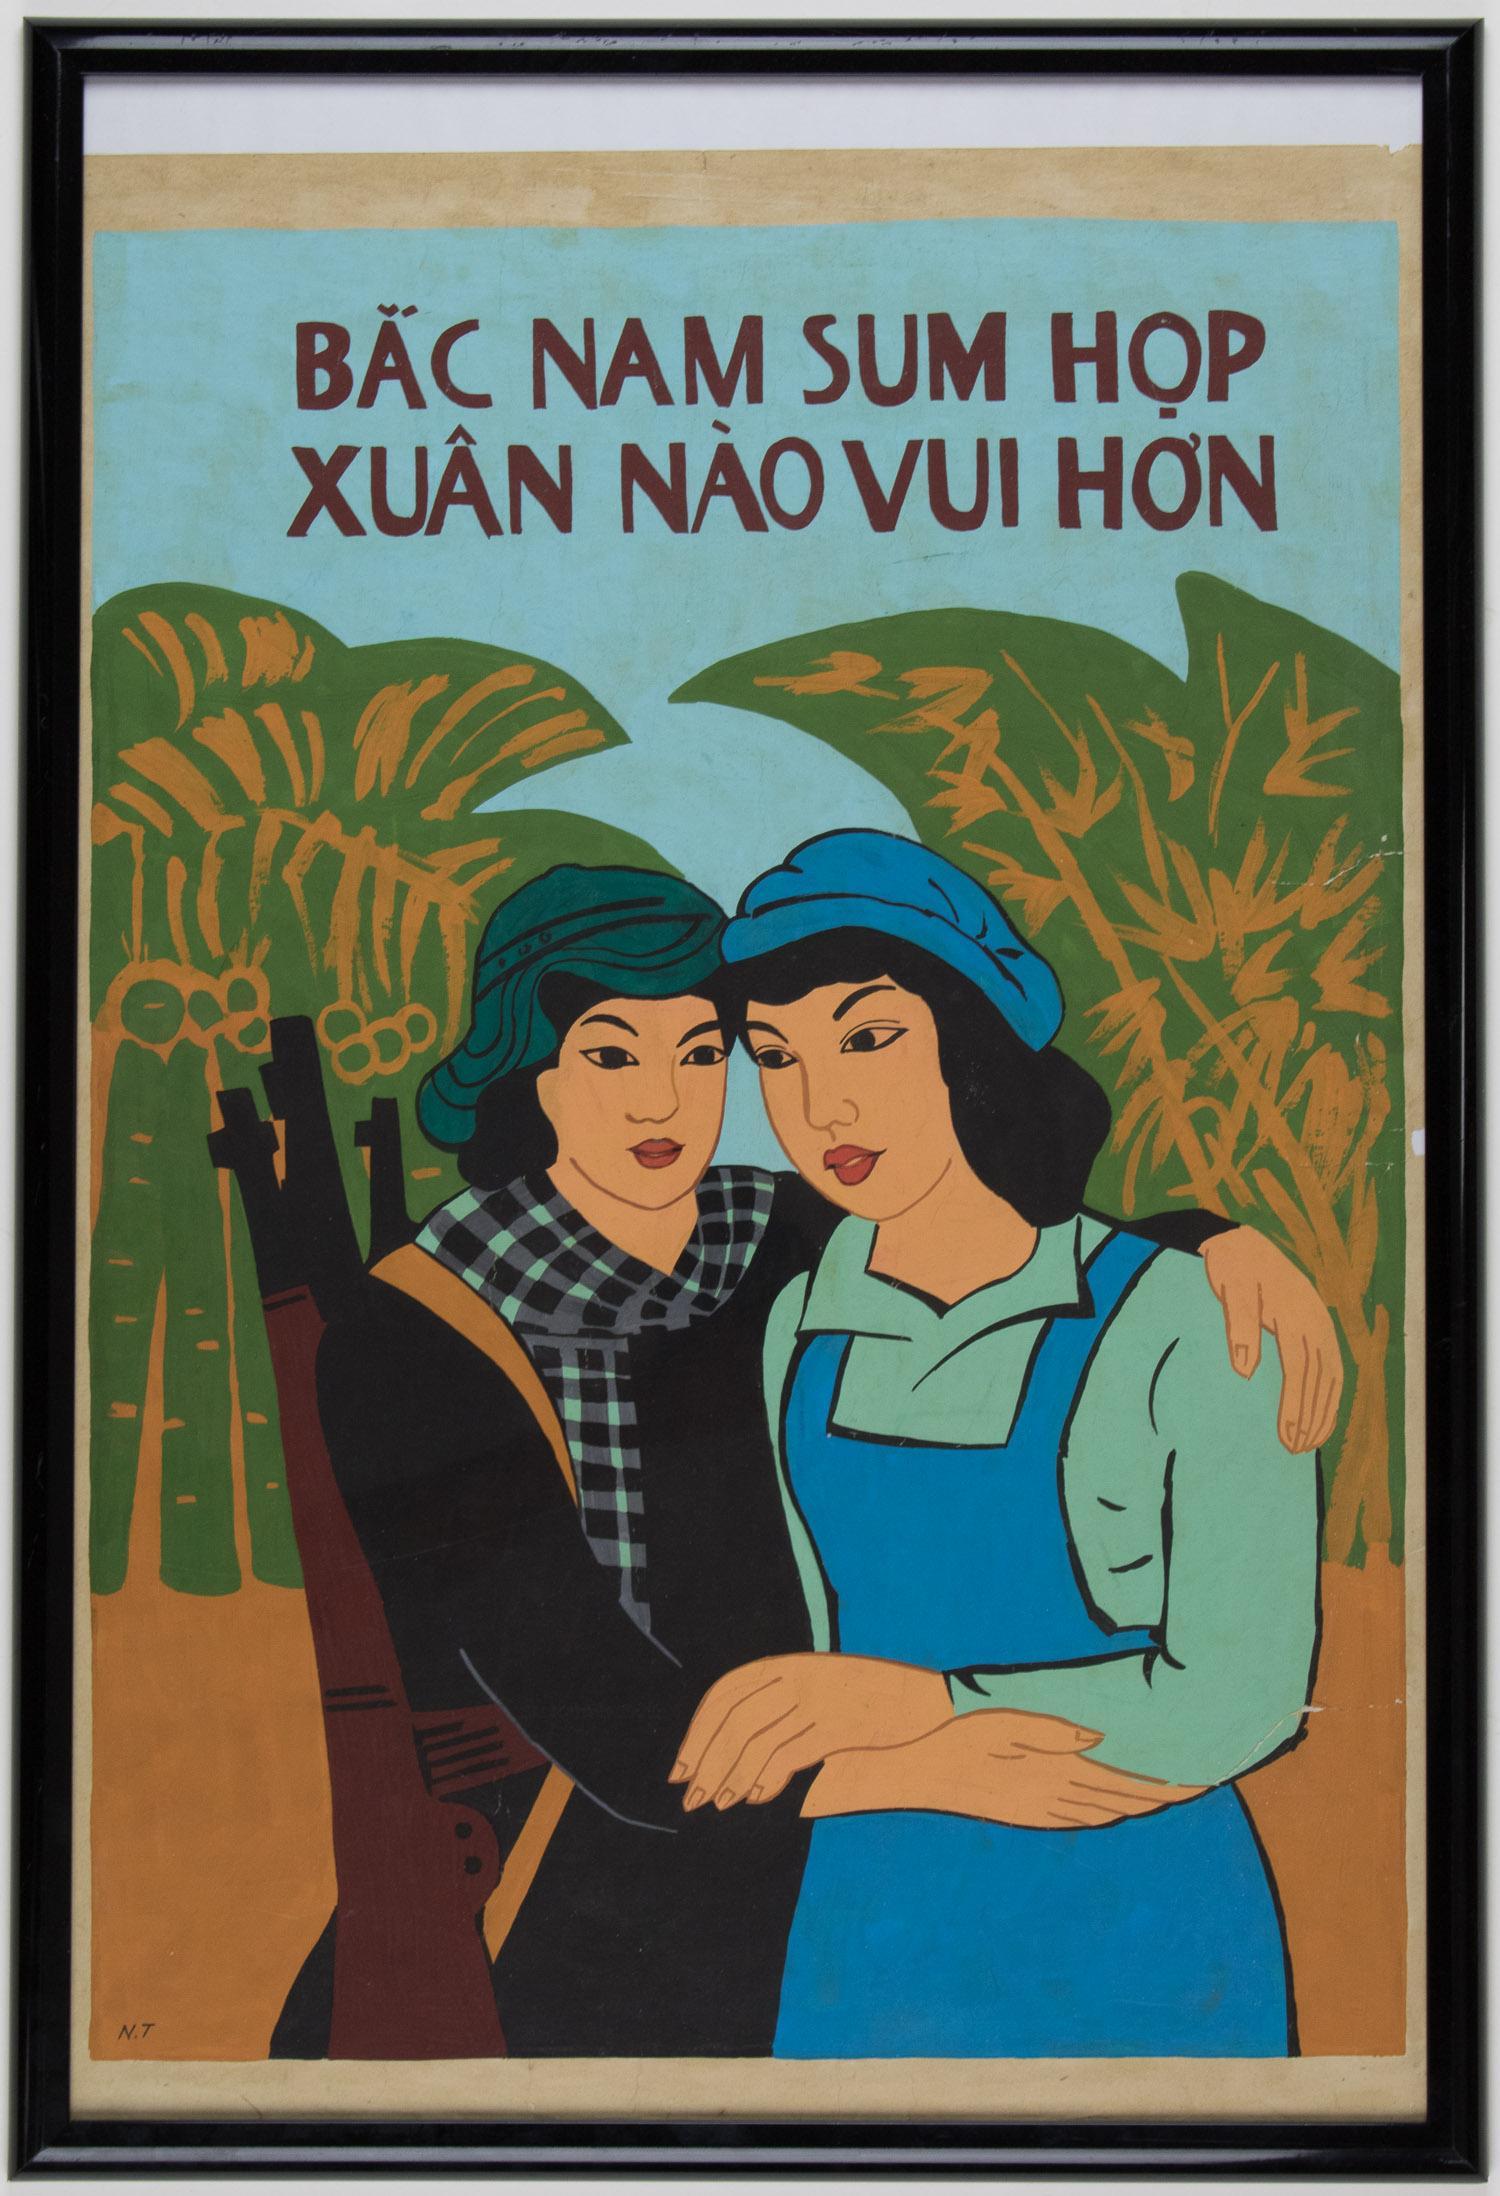 VIETNAM UNIFICATION POSTERS